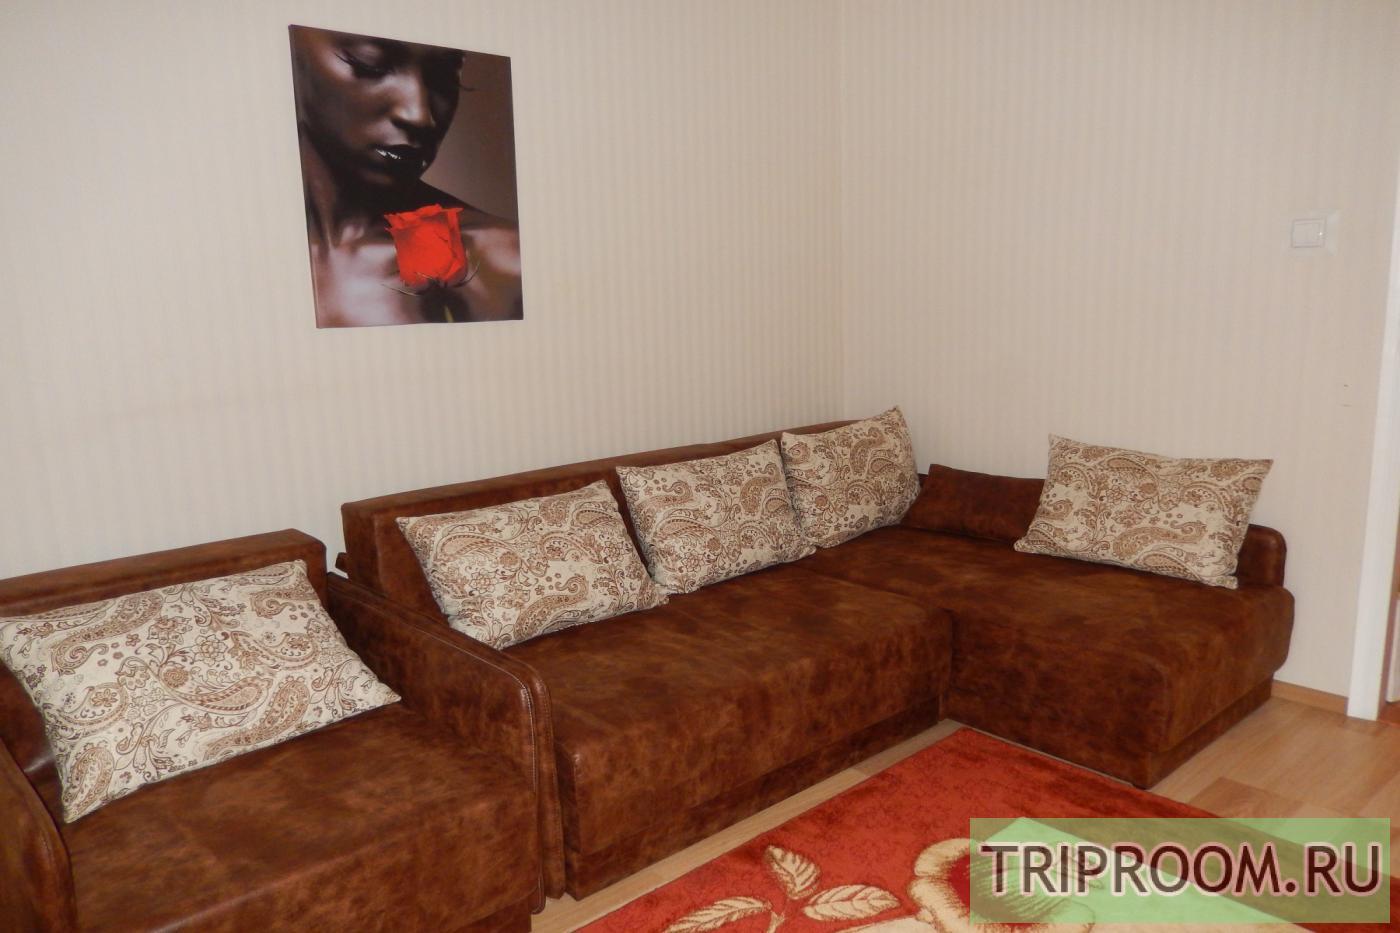 2-комнатная квартира посуточно (вариант № 21949), ул. Очаковцев улица, фото № 5